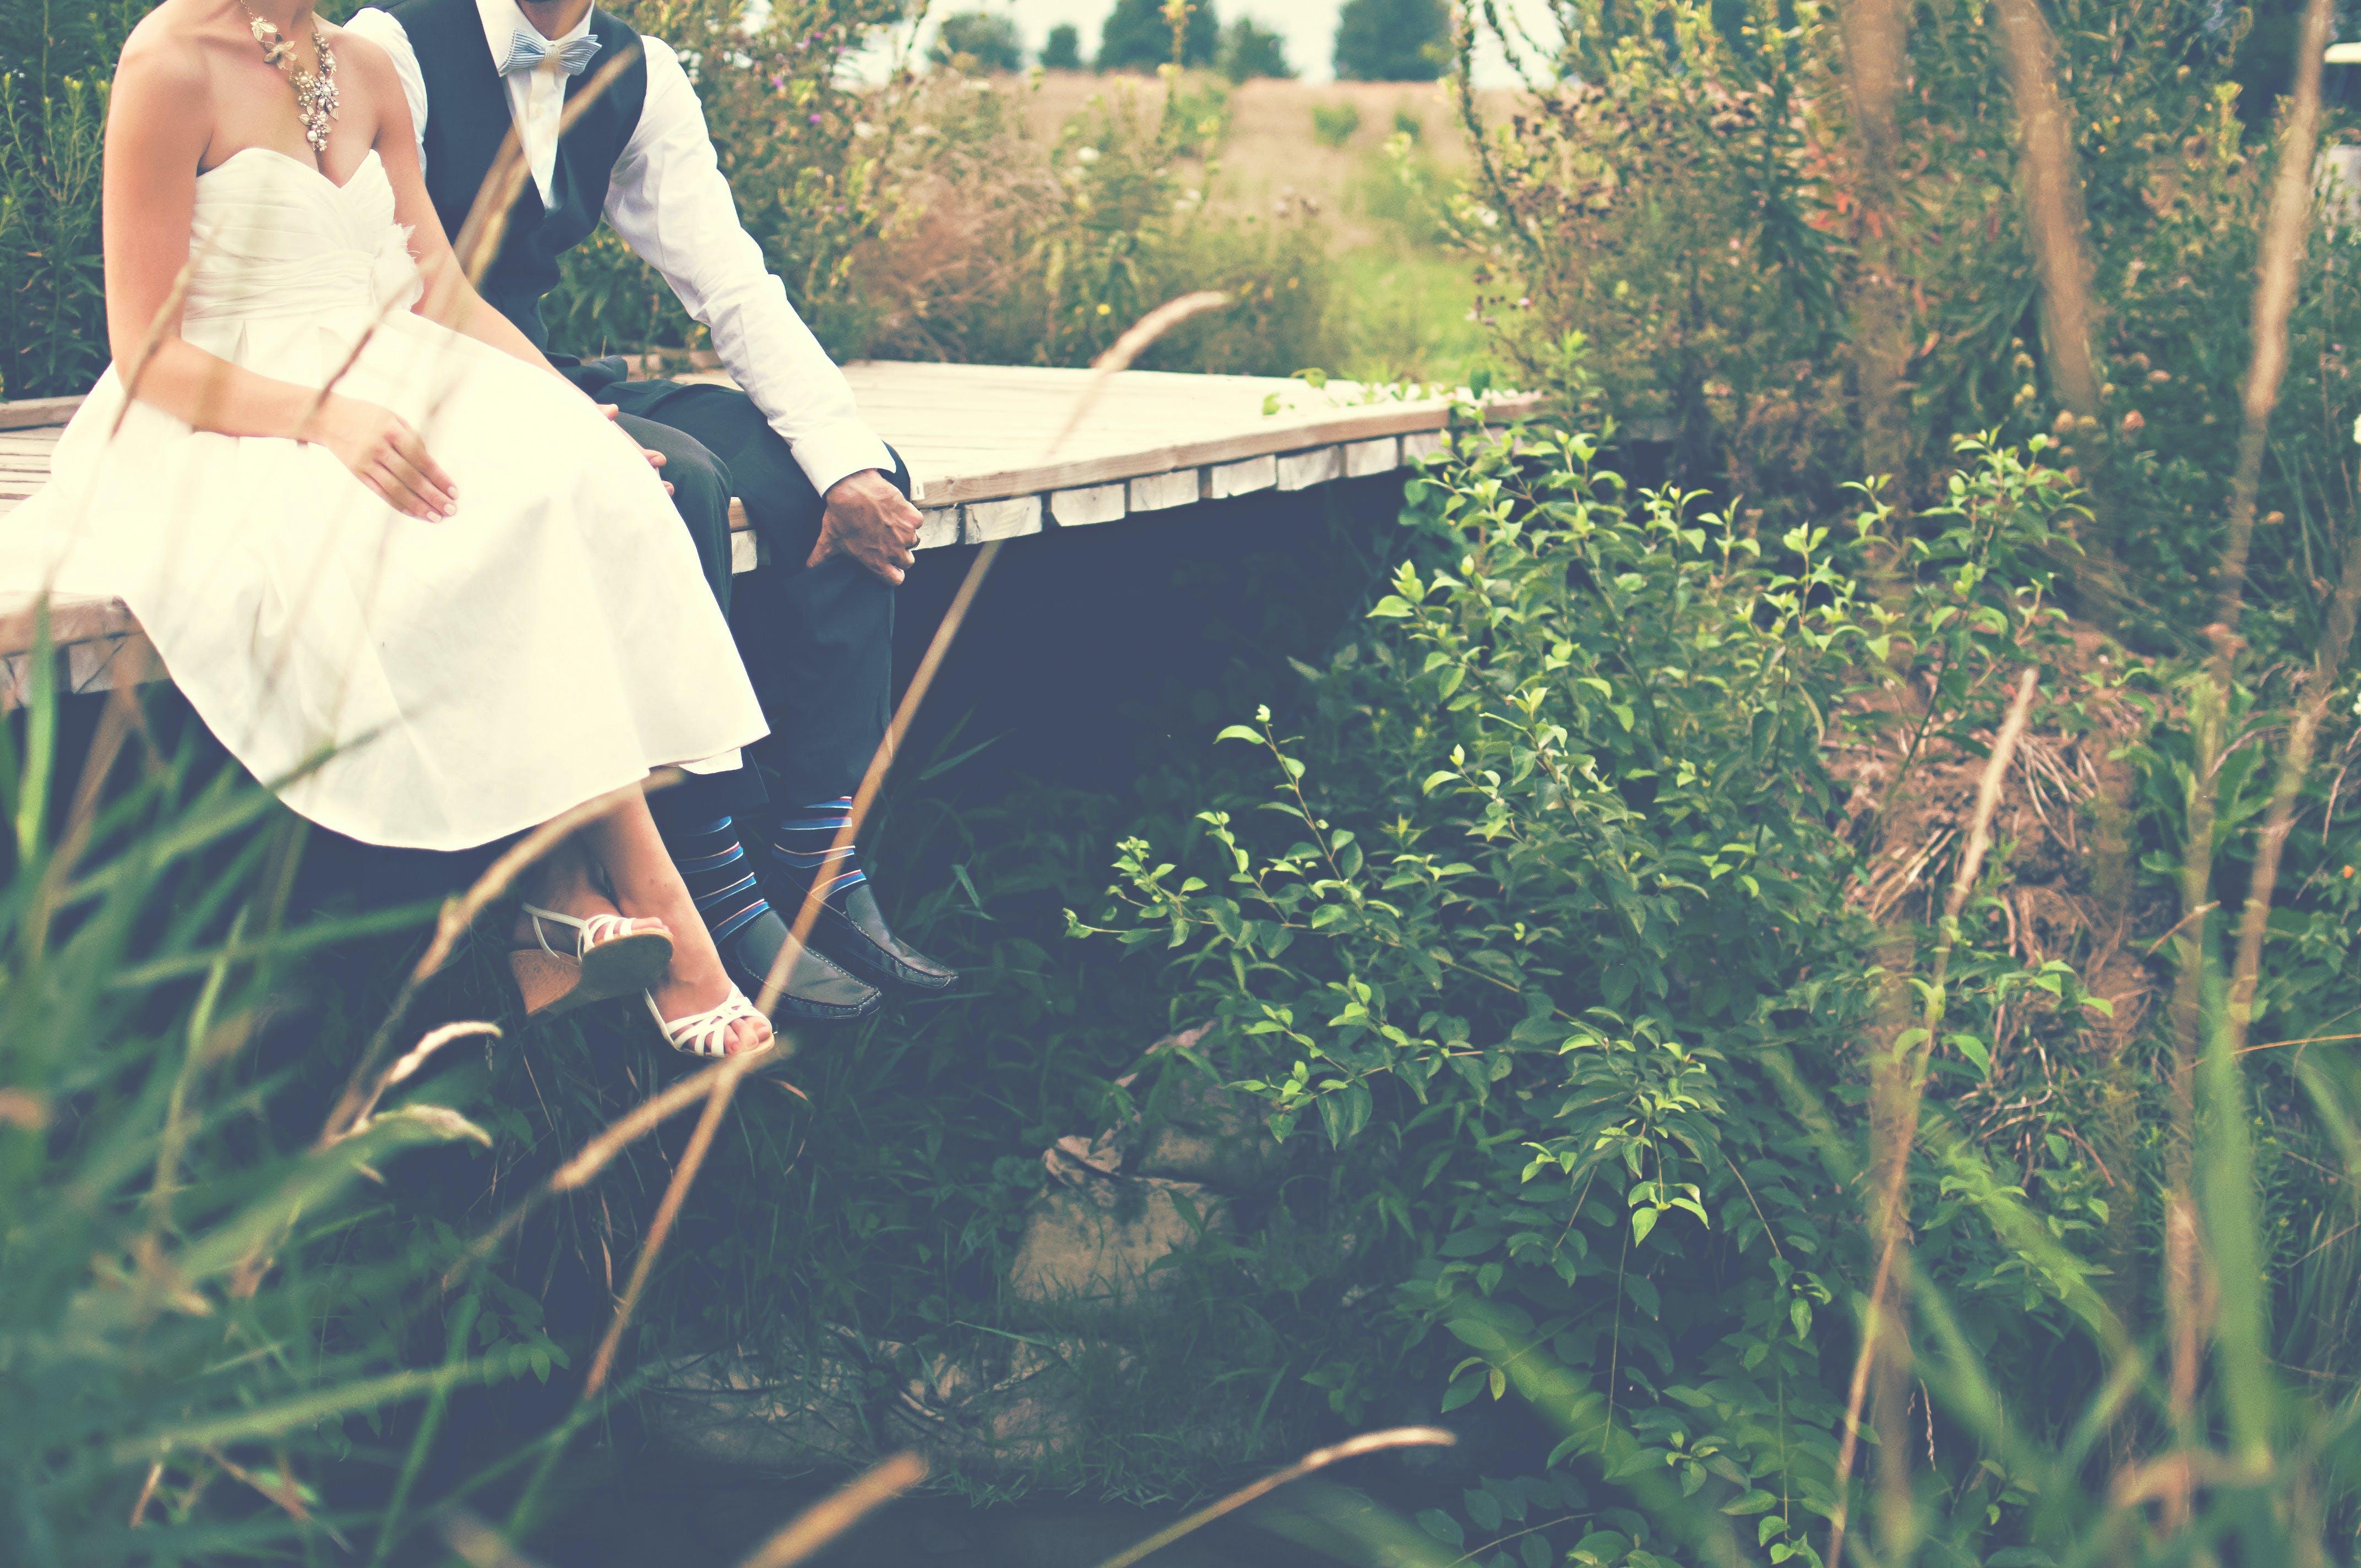 Man and Woman Seating on Bridge